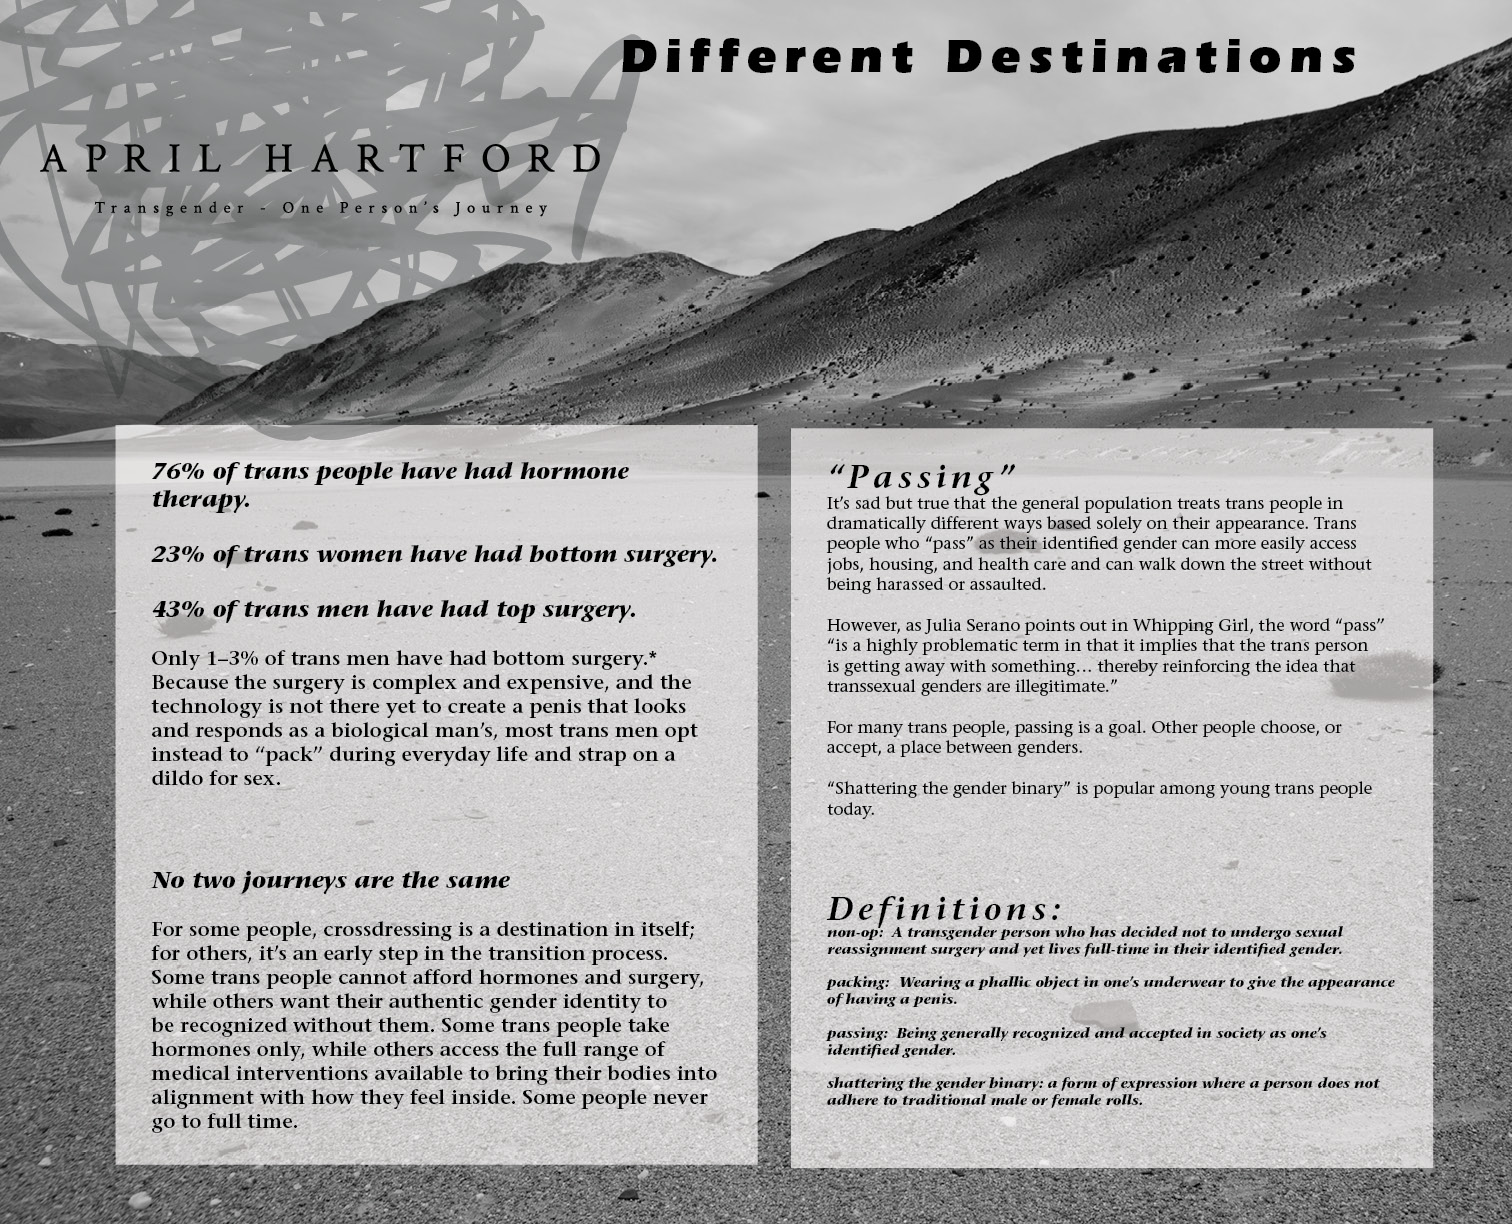 Different Destinations